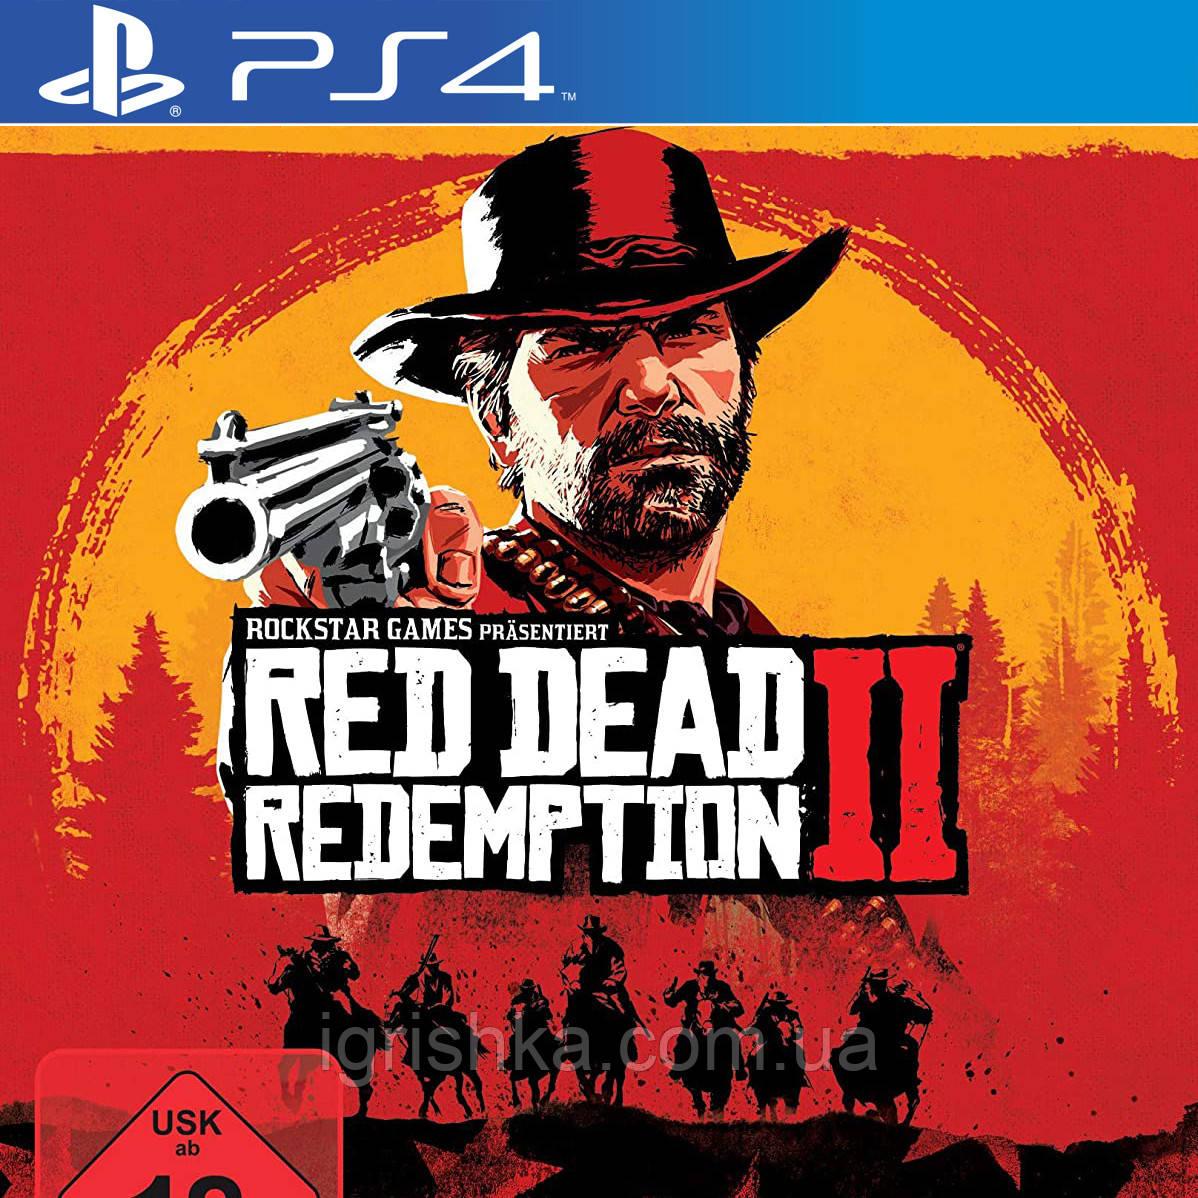 Red Dead Redemption 2 Ps4 (Цифровой аккаунт для PlayStation 4) П3